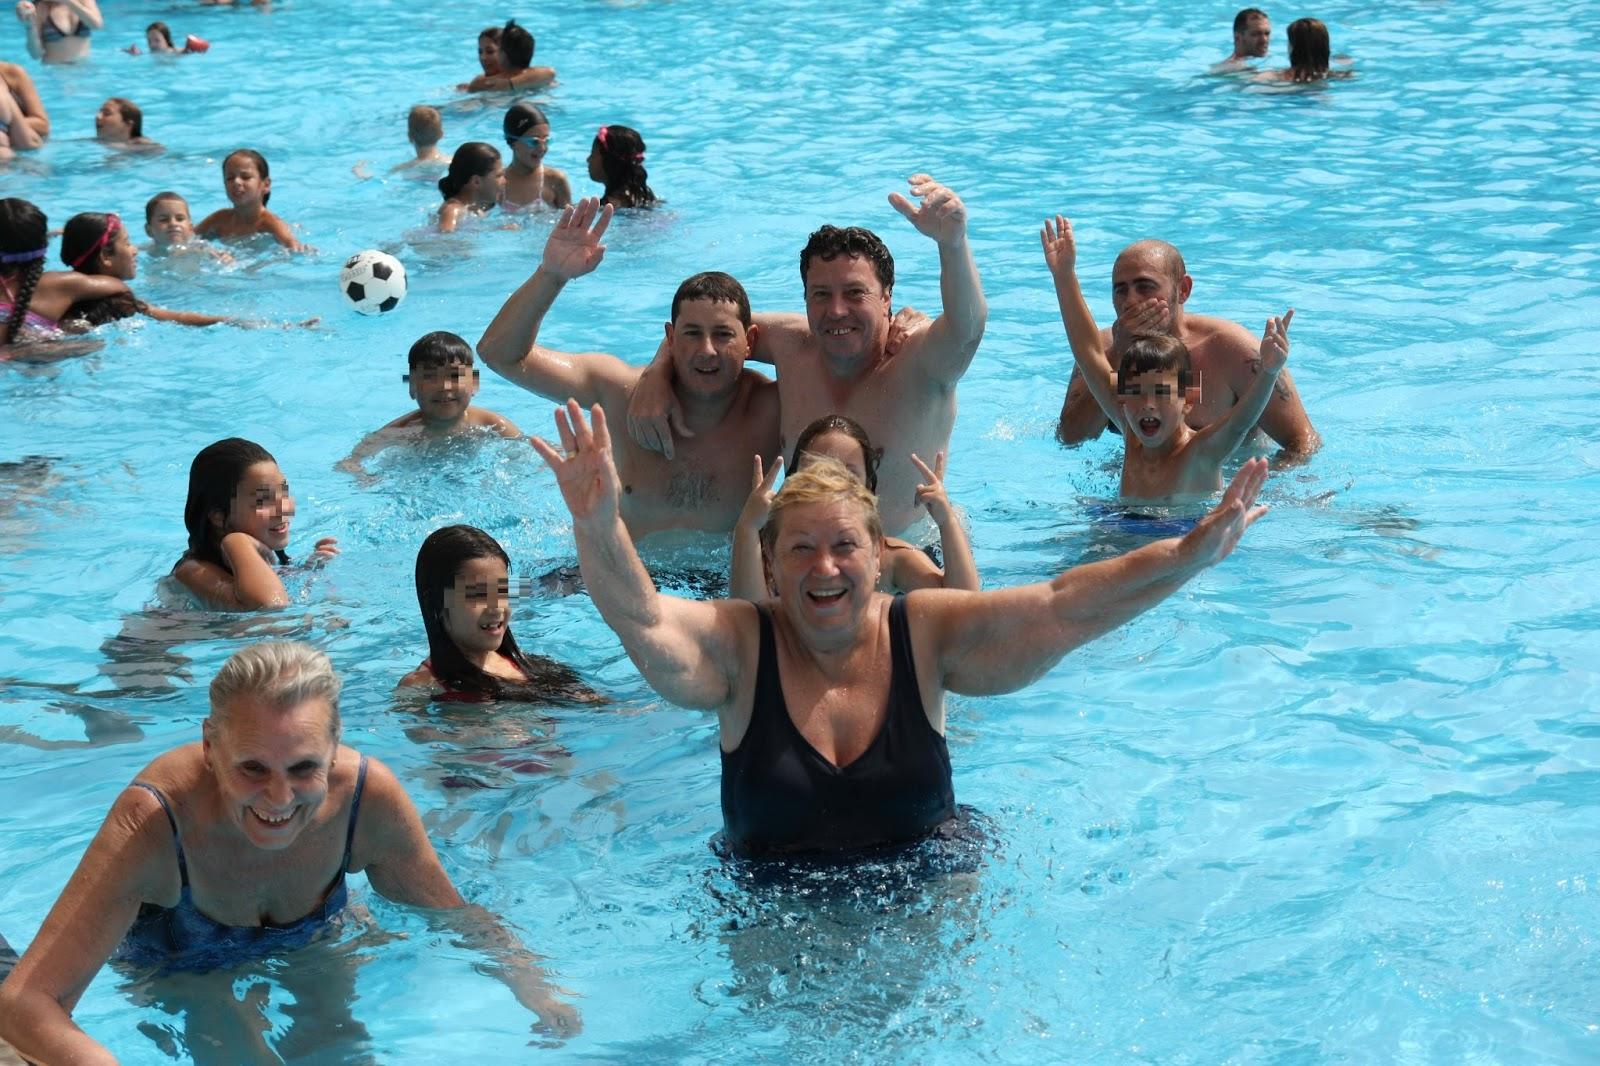 Este domingo 17 de septiembre de 2017 cerrar la piscina for Piscina municipal aluche